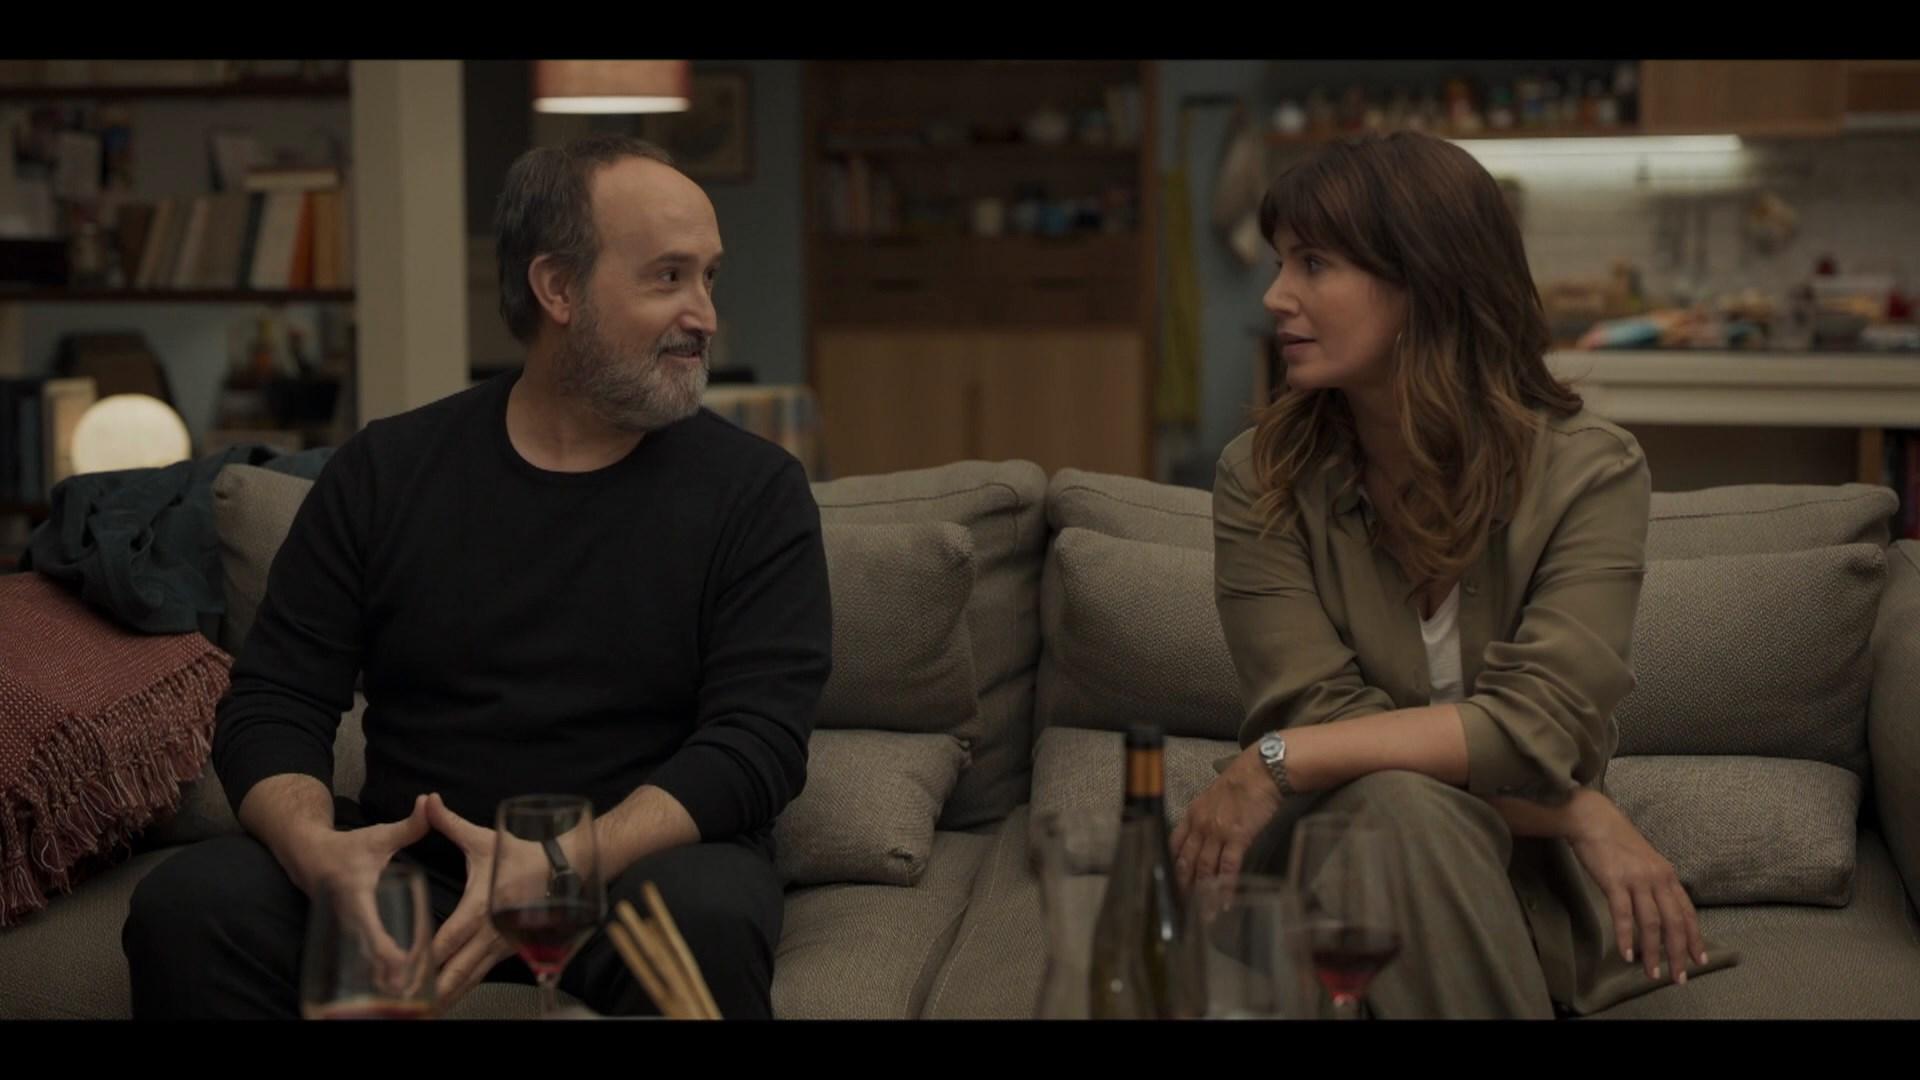 Sentimental (2020) 1080p WEB-DL